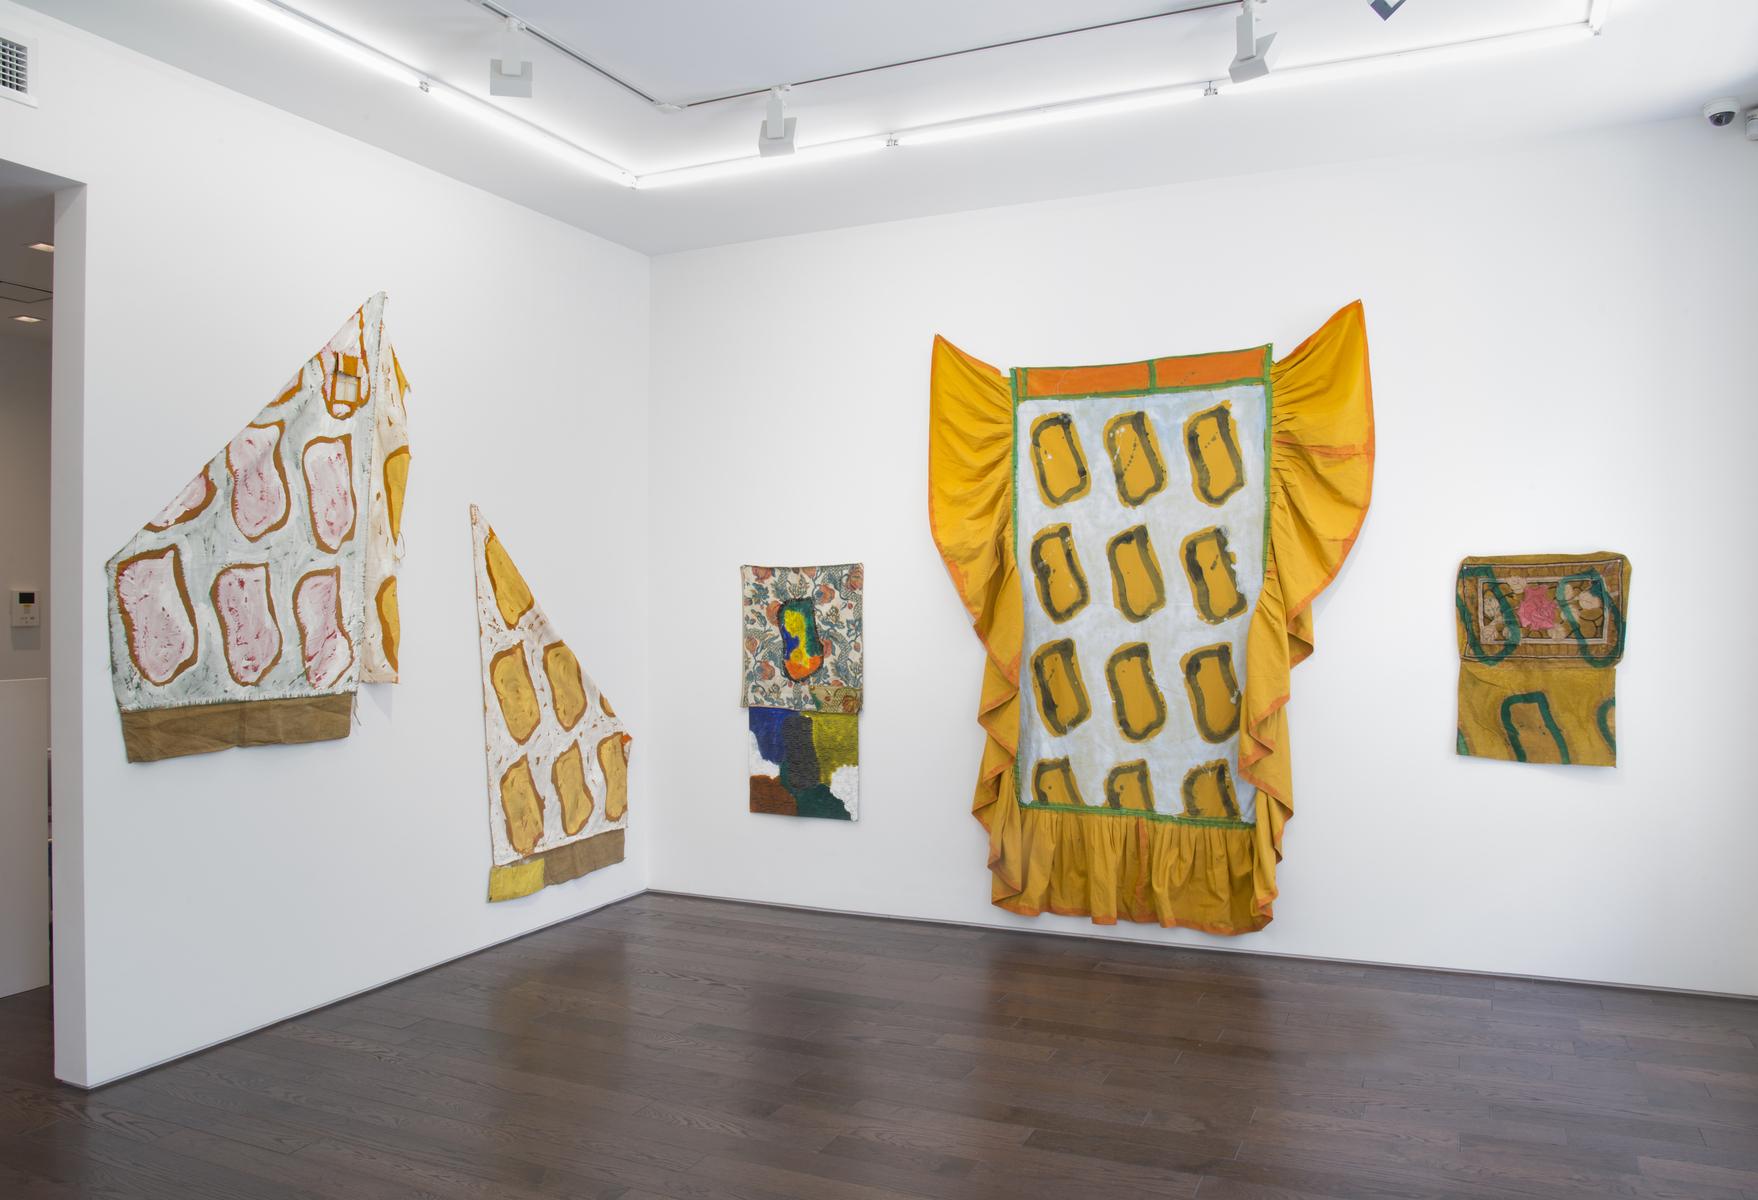 1_Claude Viallat Major 2017 New York 1055